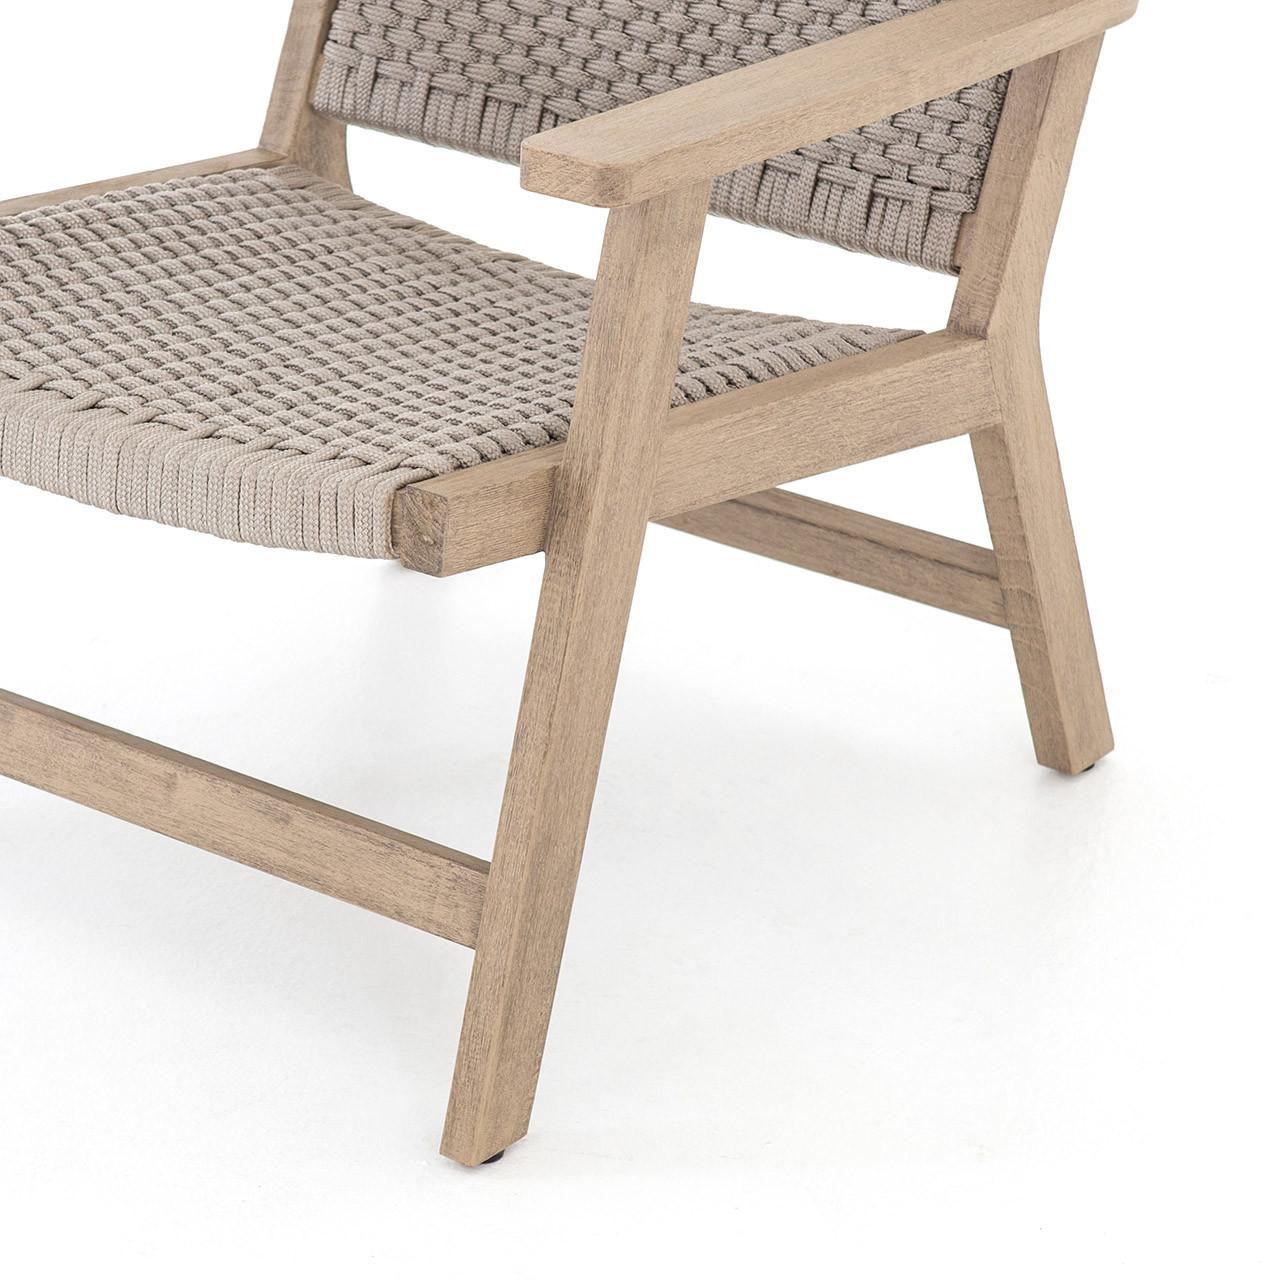 Teak Tamarack Outdoor Lounge Chair + Ottoman - Sand